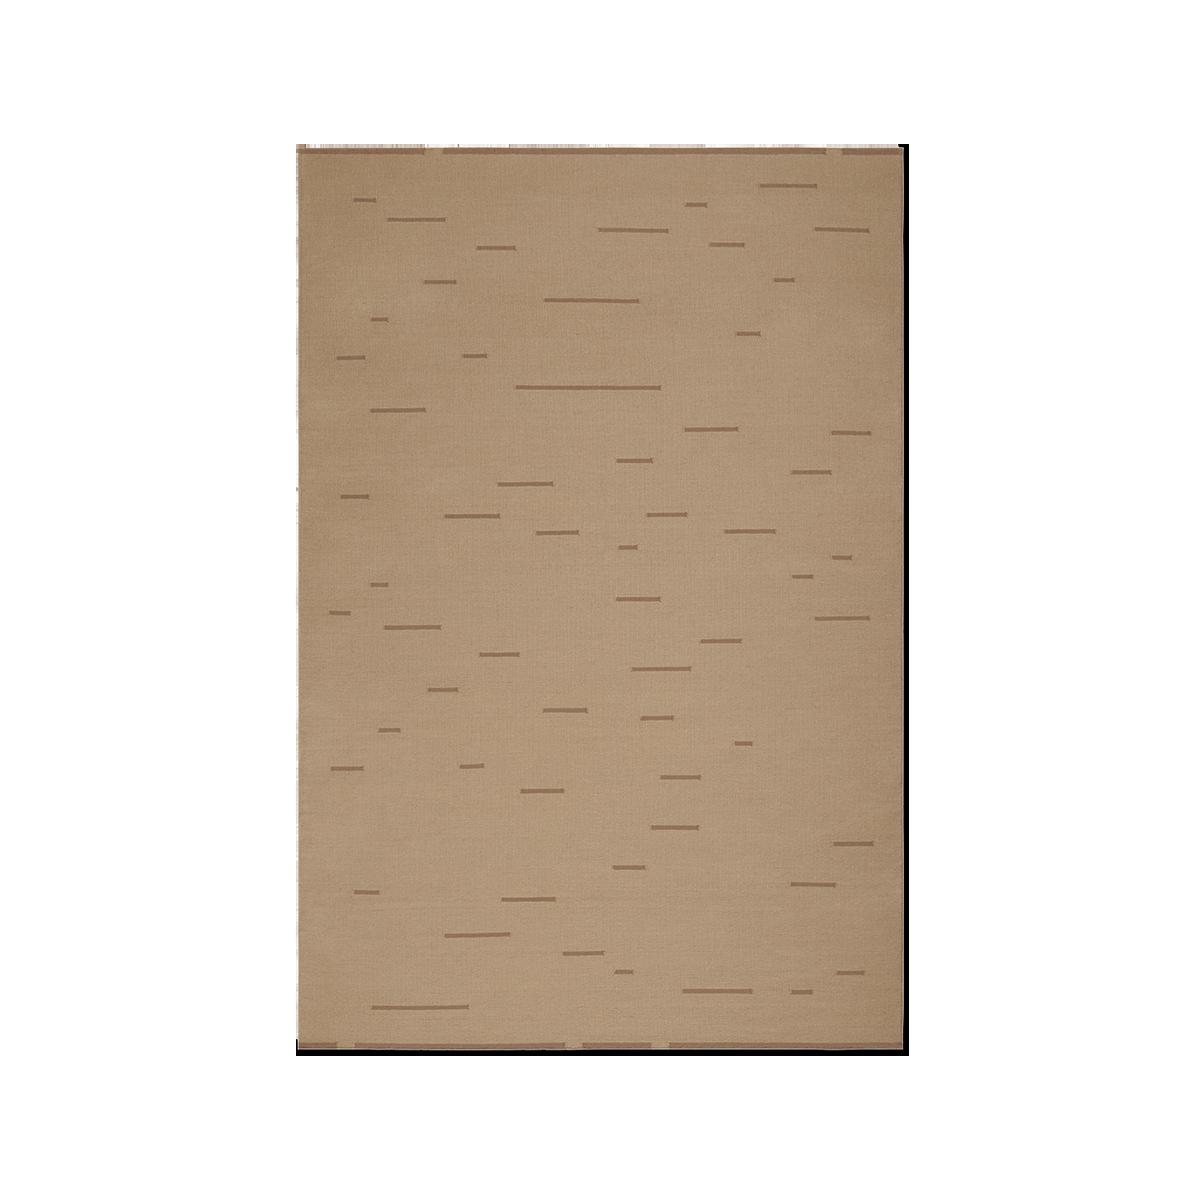 Product image of Rain Beige flat-weave rug.